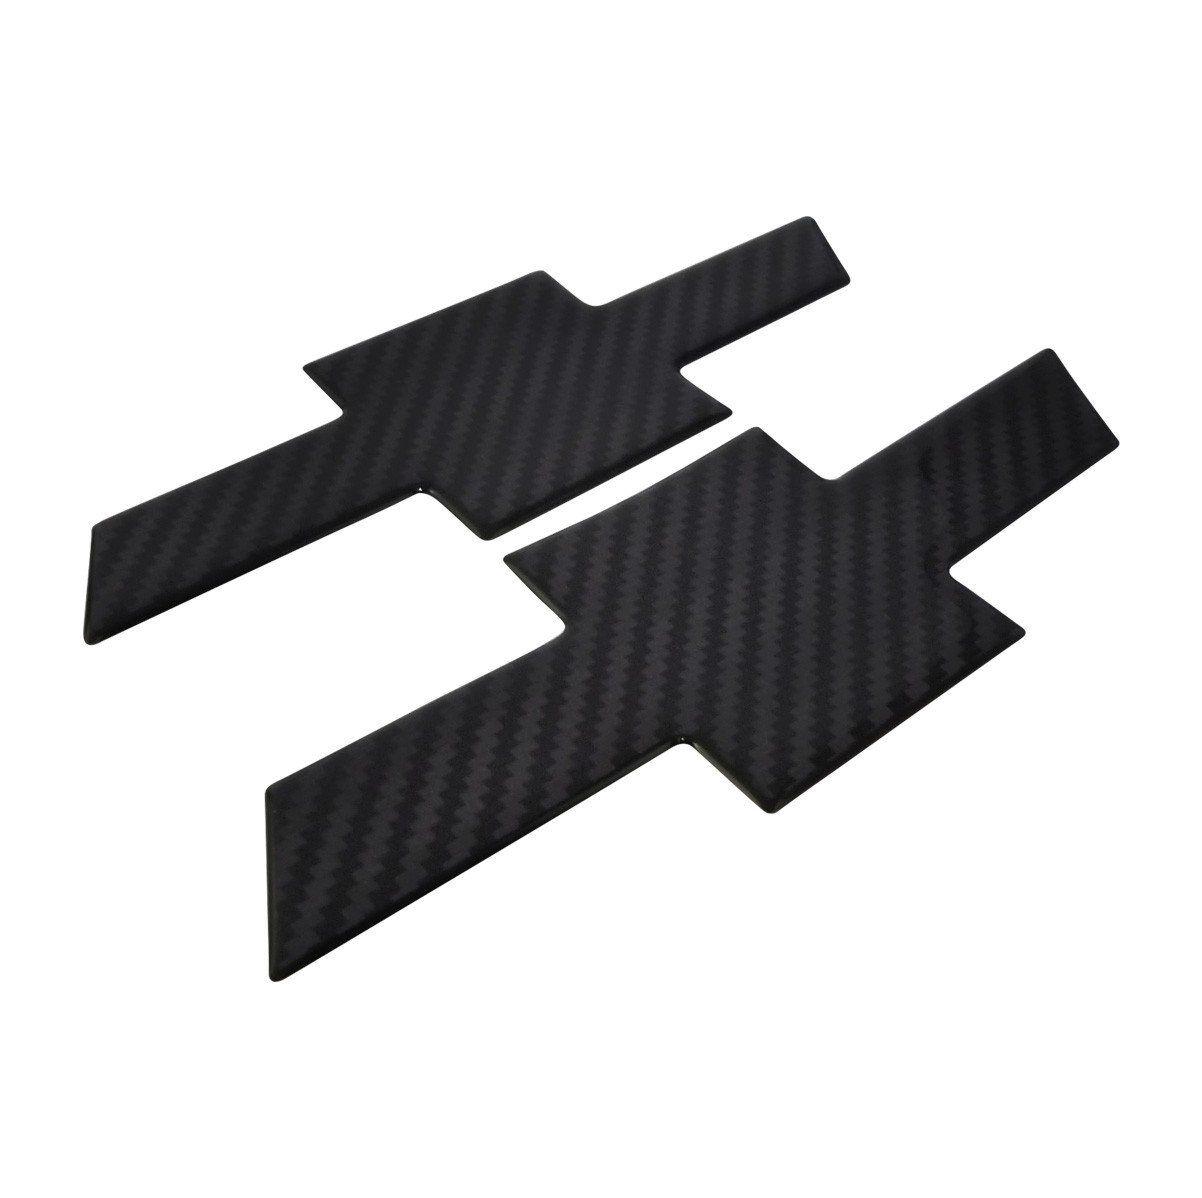 Kit Adesivo Emblema Resinado Carbono Gm S10 2018